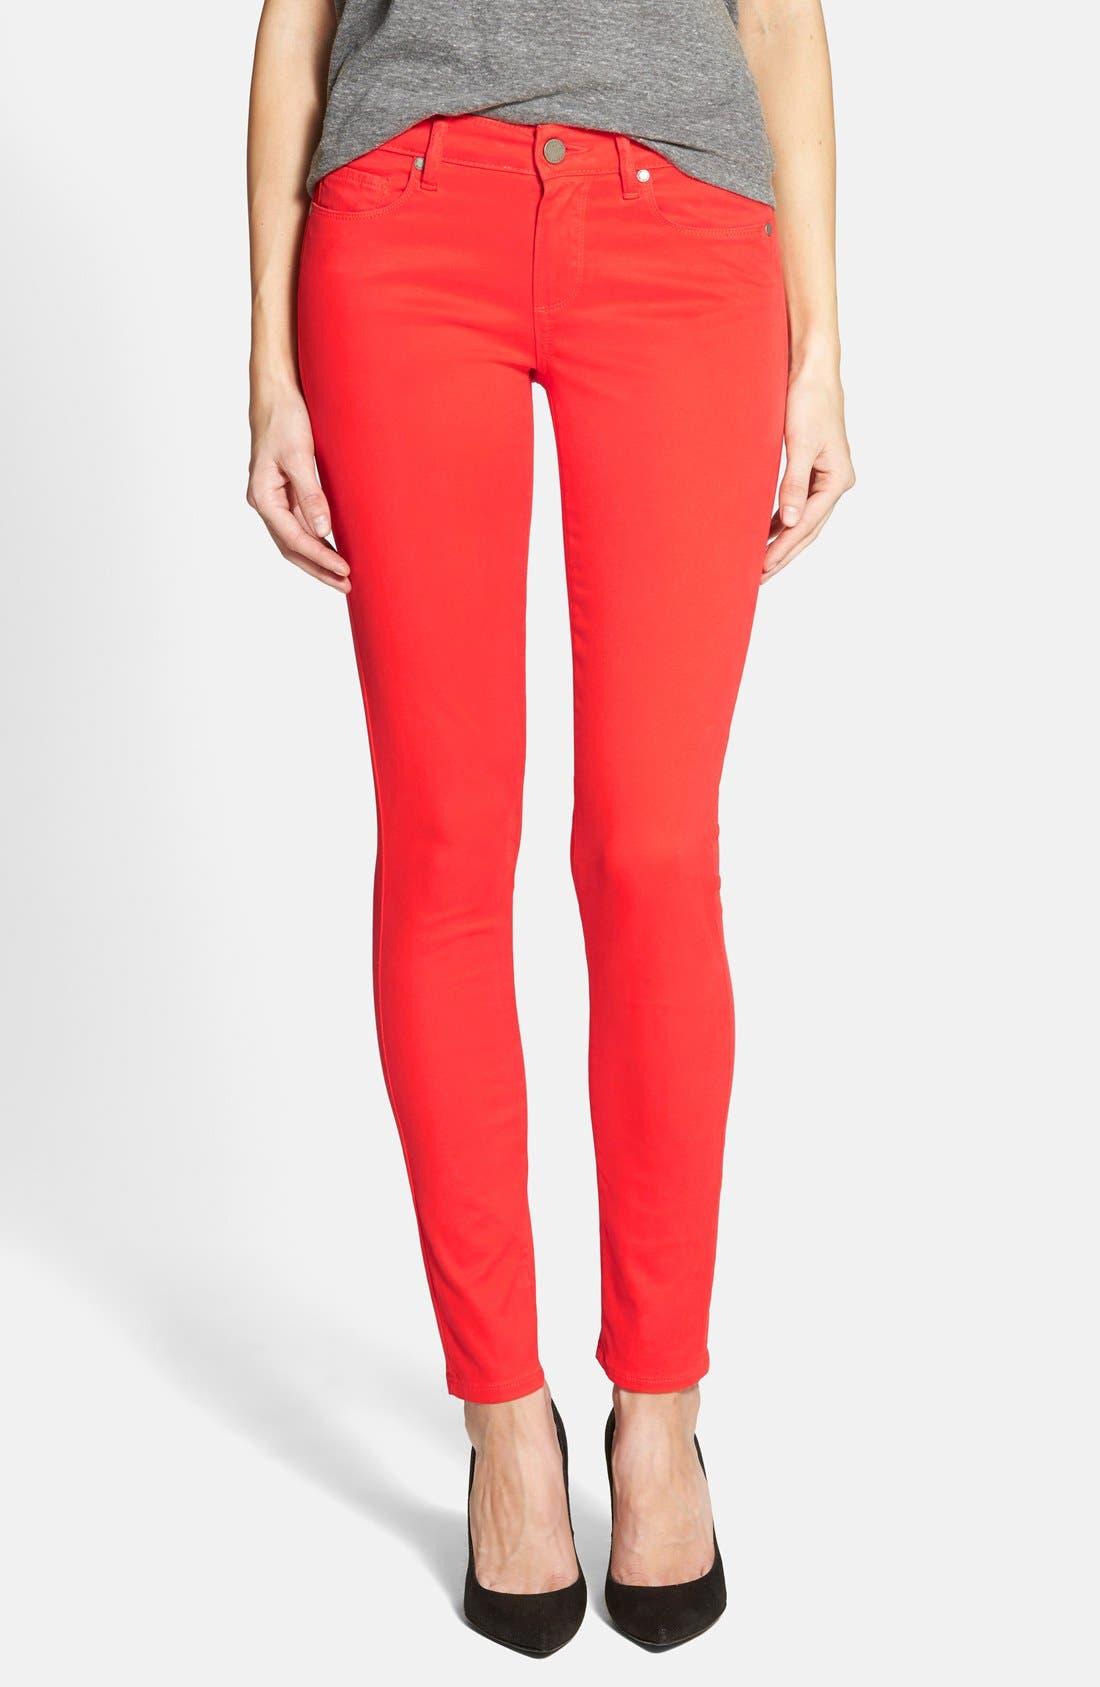 Alternate Image 1 Selected - Paige Denim 'Verdugo' Ultra Skinny Jeans (Flirtatious)